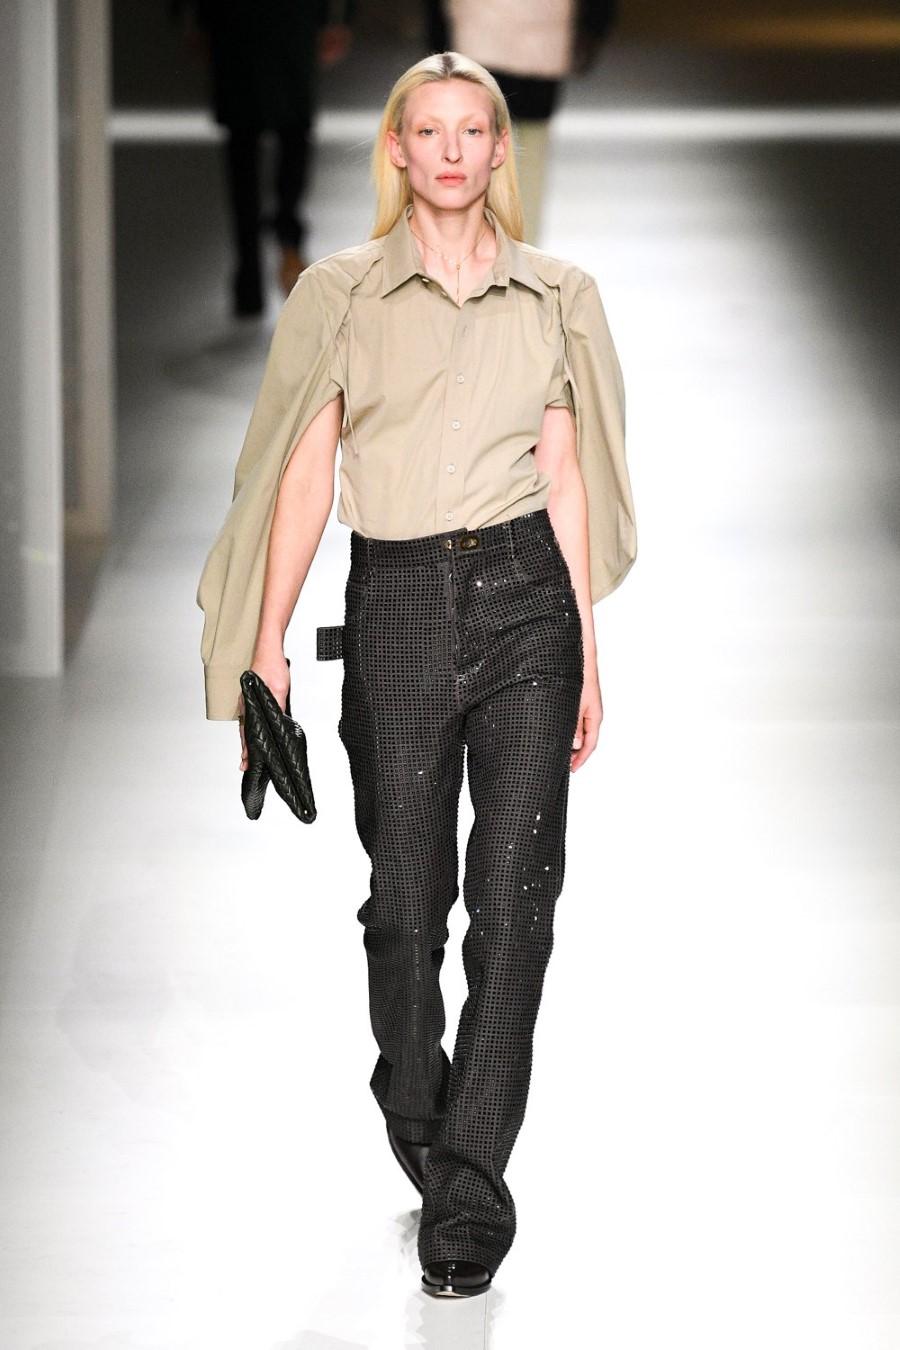 Bottega Veneta - Fall Winter 2020 - Milan Fashion WeekBottega Veneta - Fall Winter 2020 - Milan Fashion Week